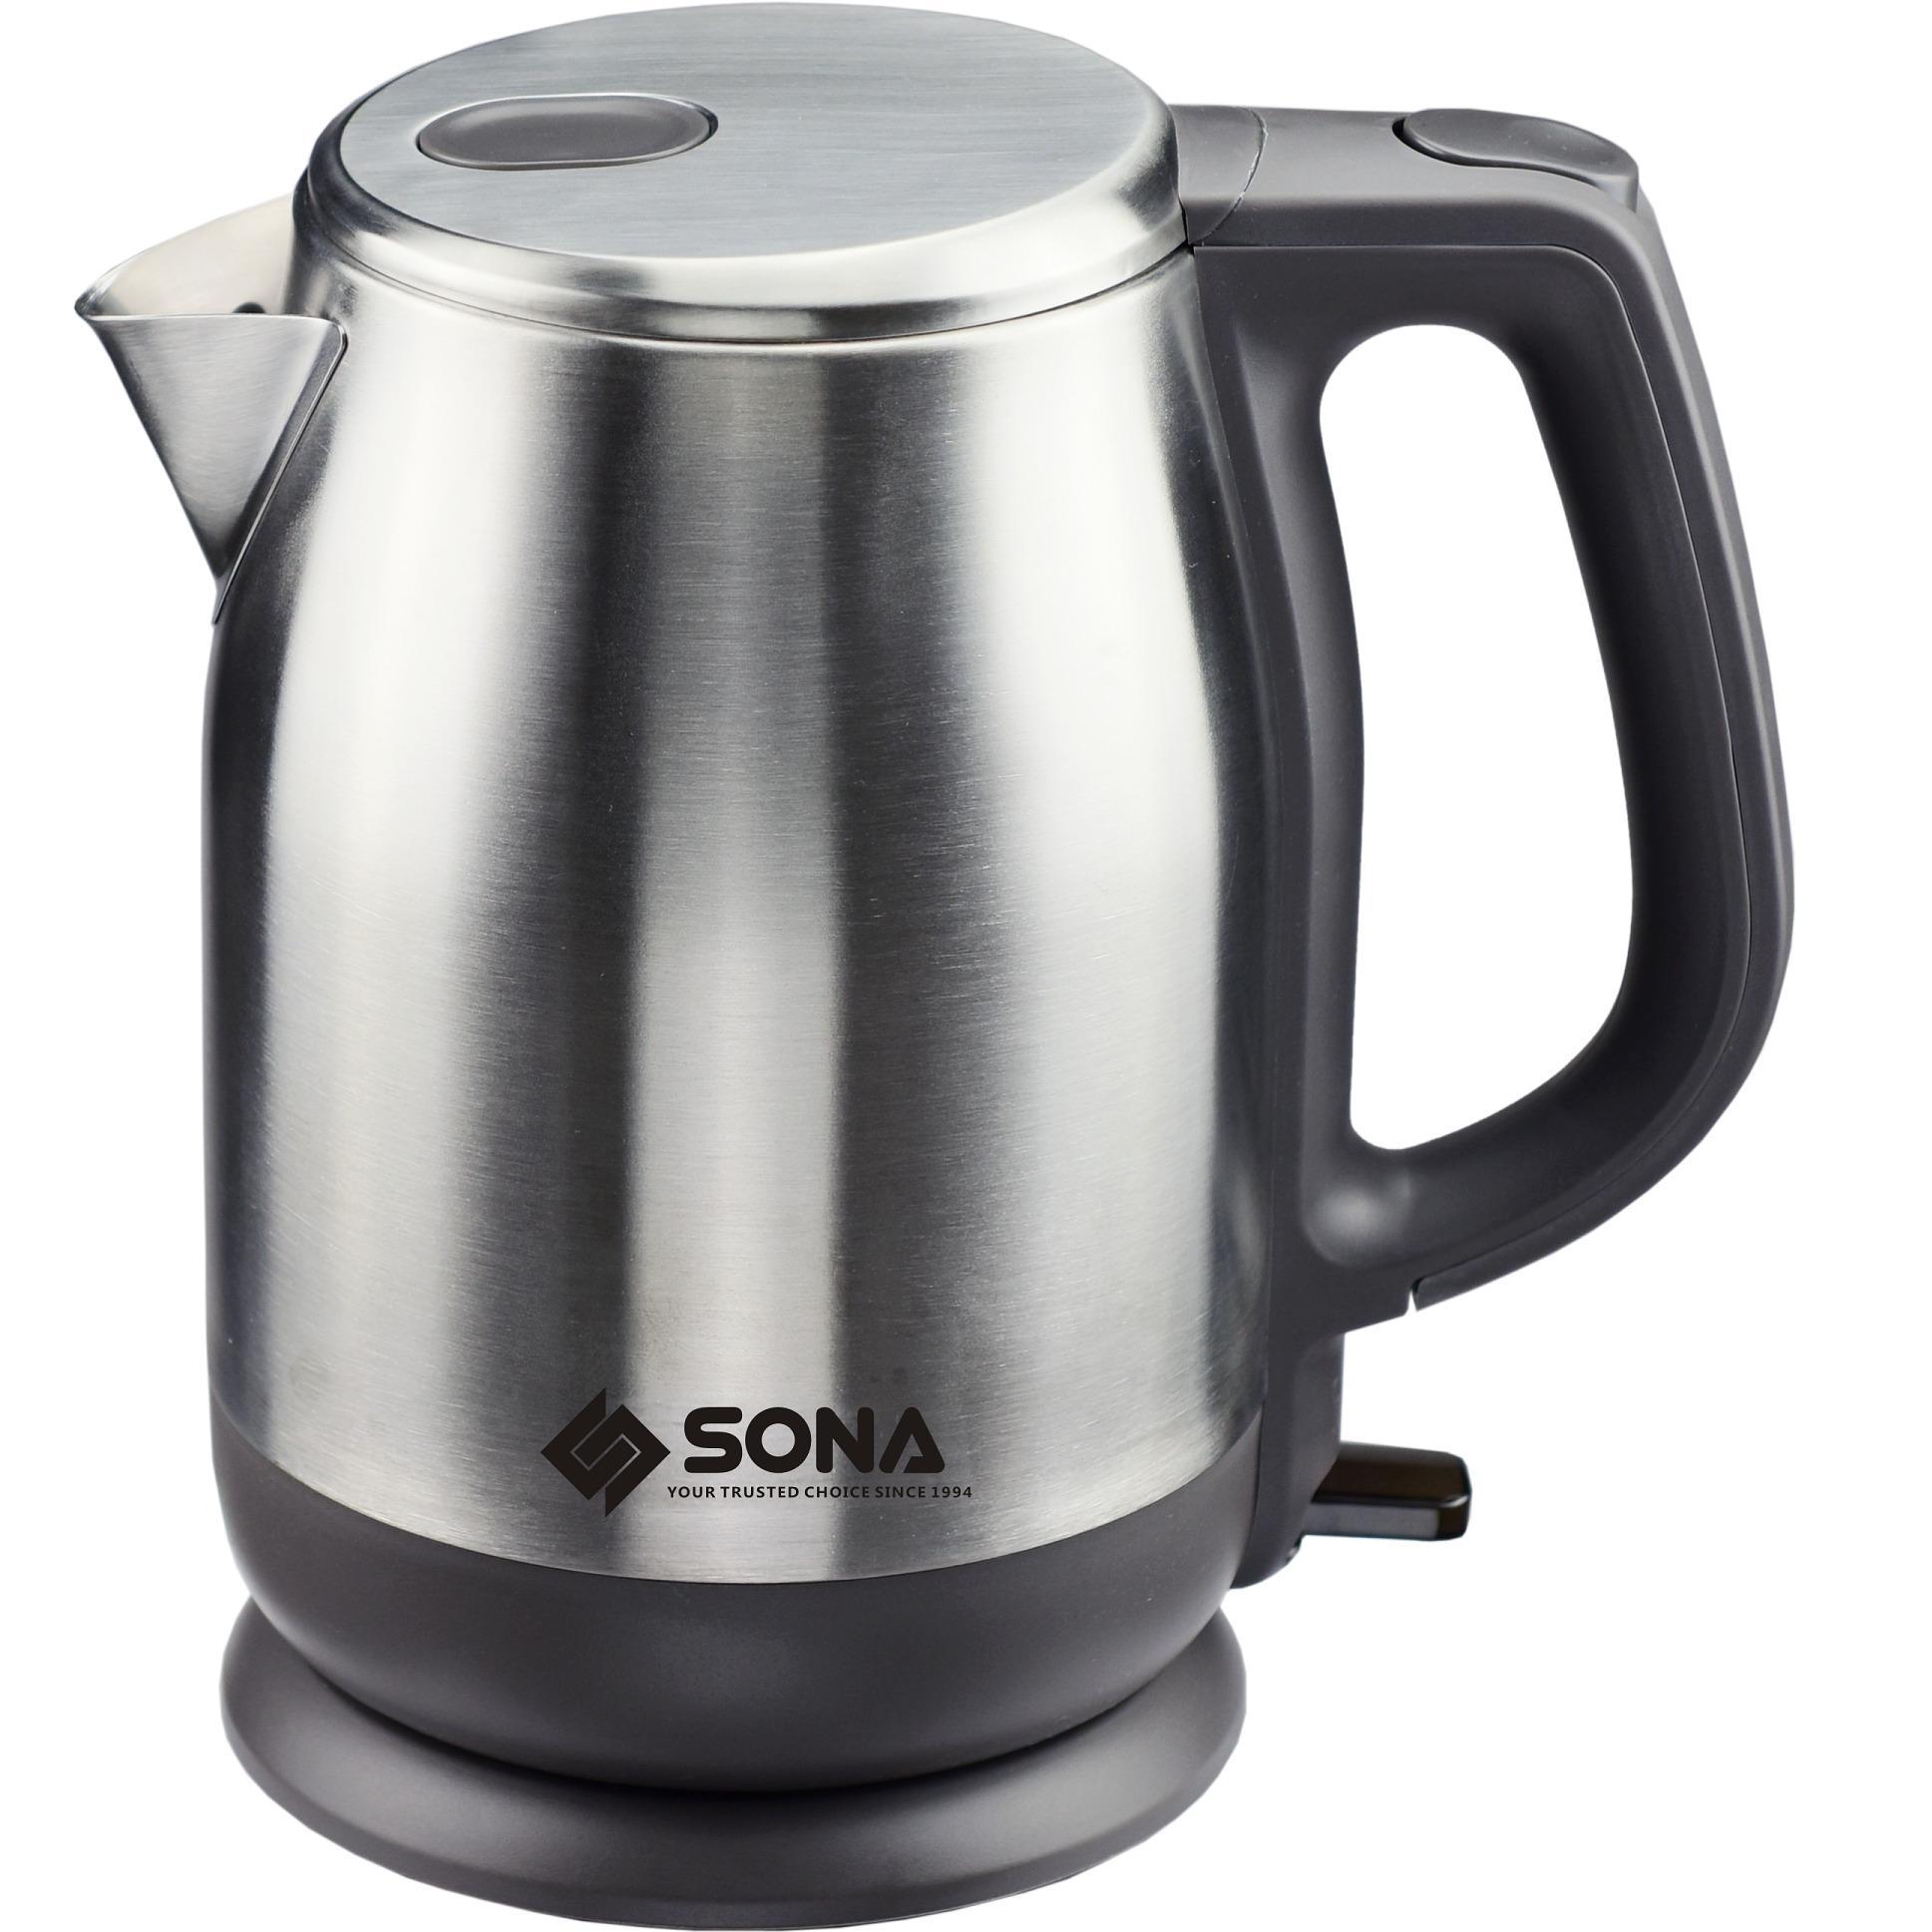 New Sona Sck5011 Stainless Steel Kettle Jug